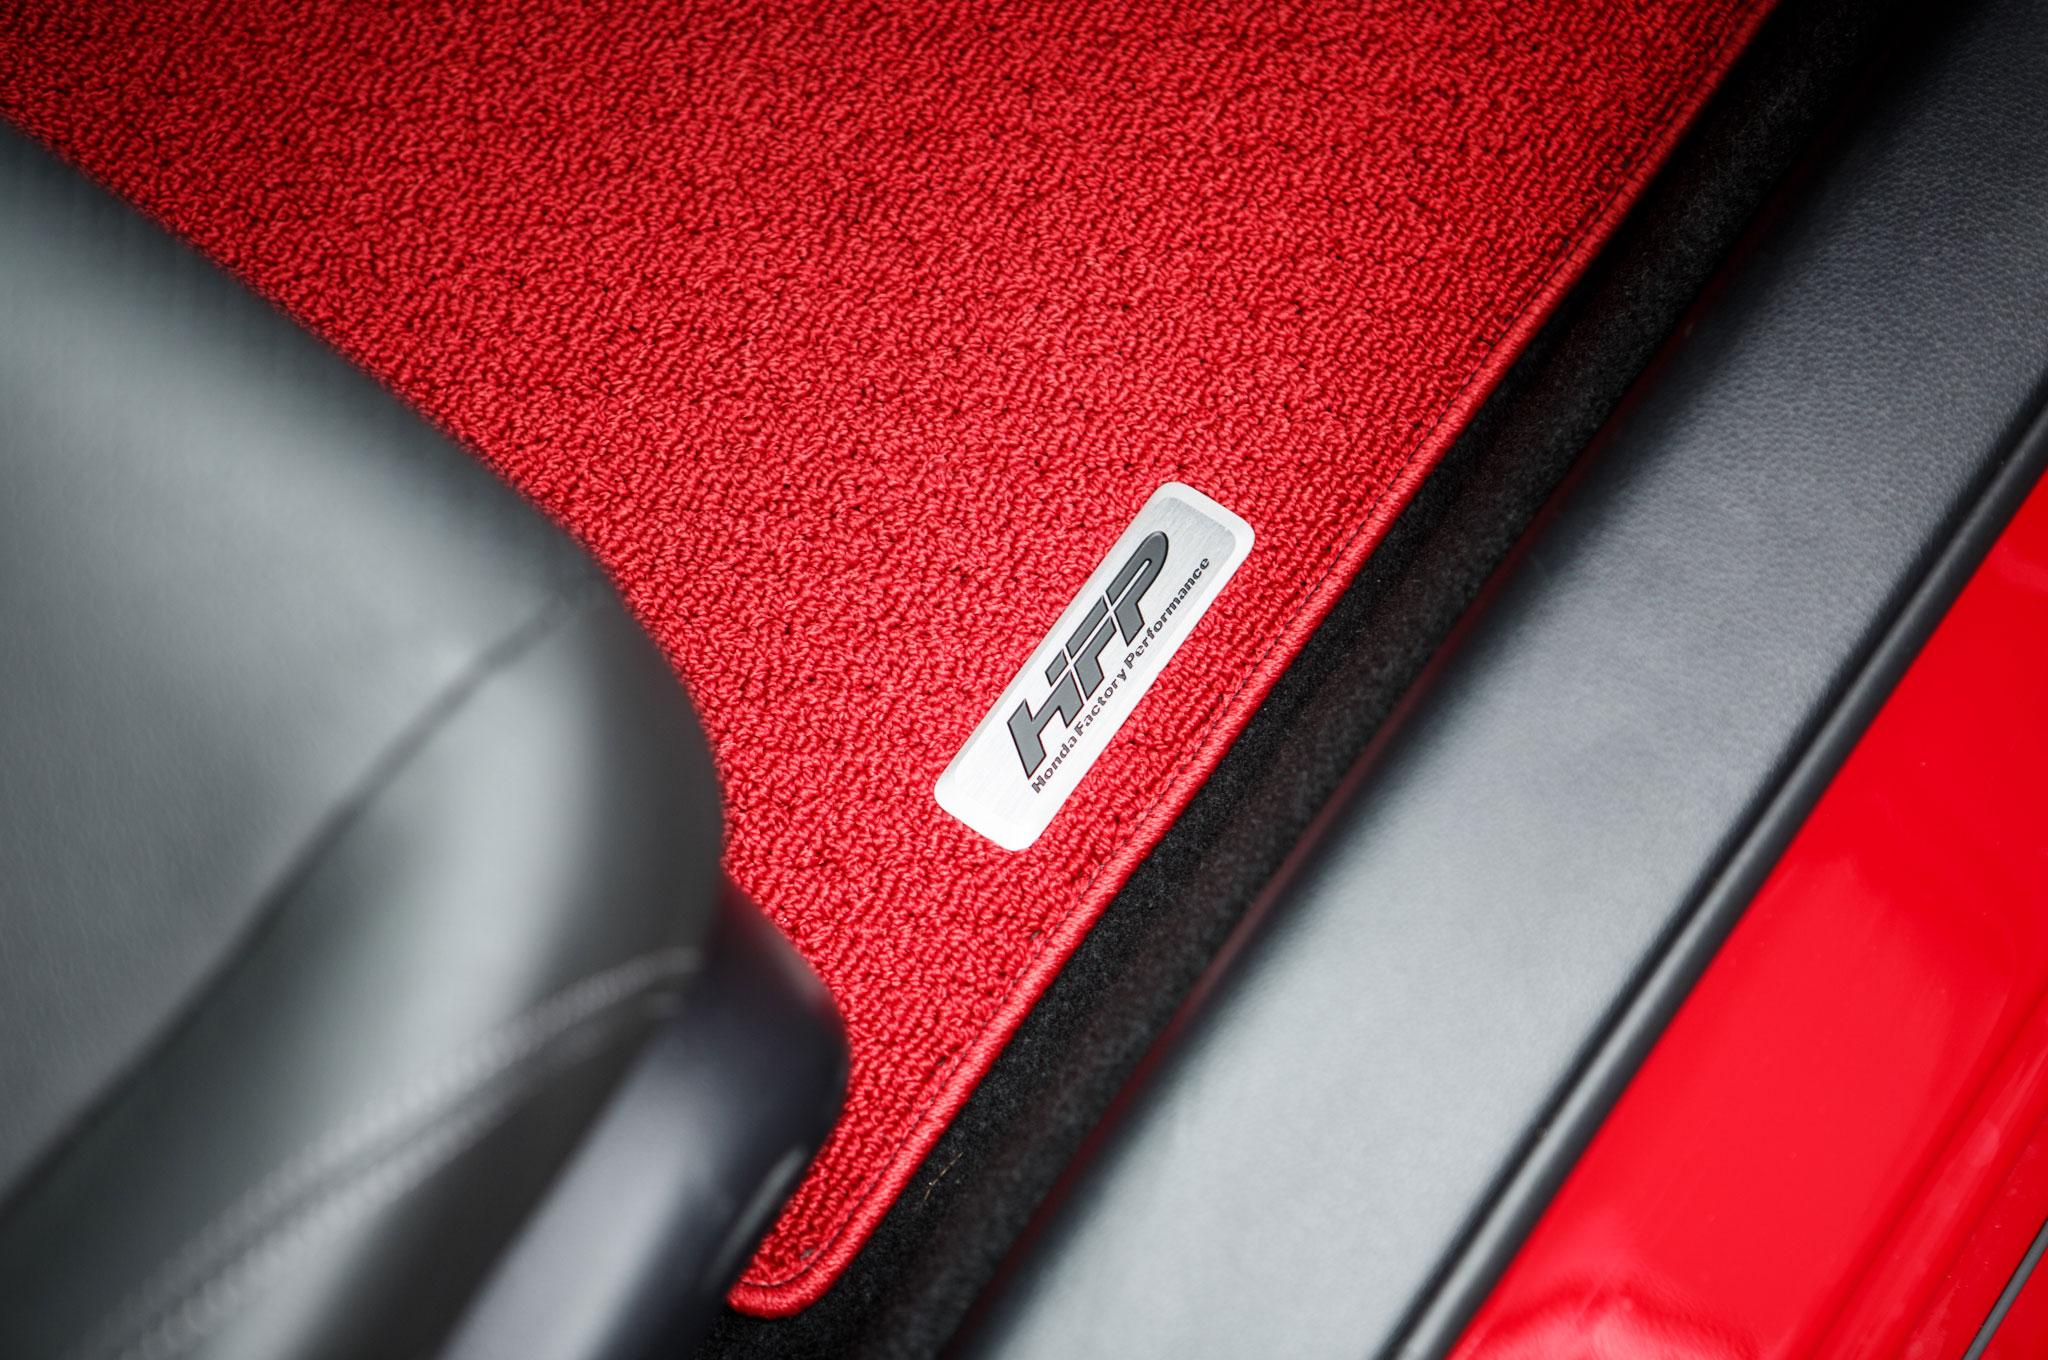 Honda Accord Exl V Coupe Hfp Floor Mat on 1995 Honda Accord Abs Wiring Diagram